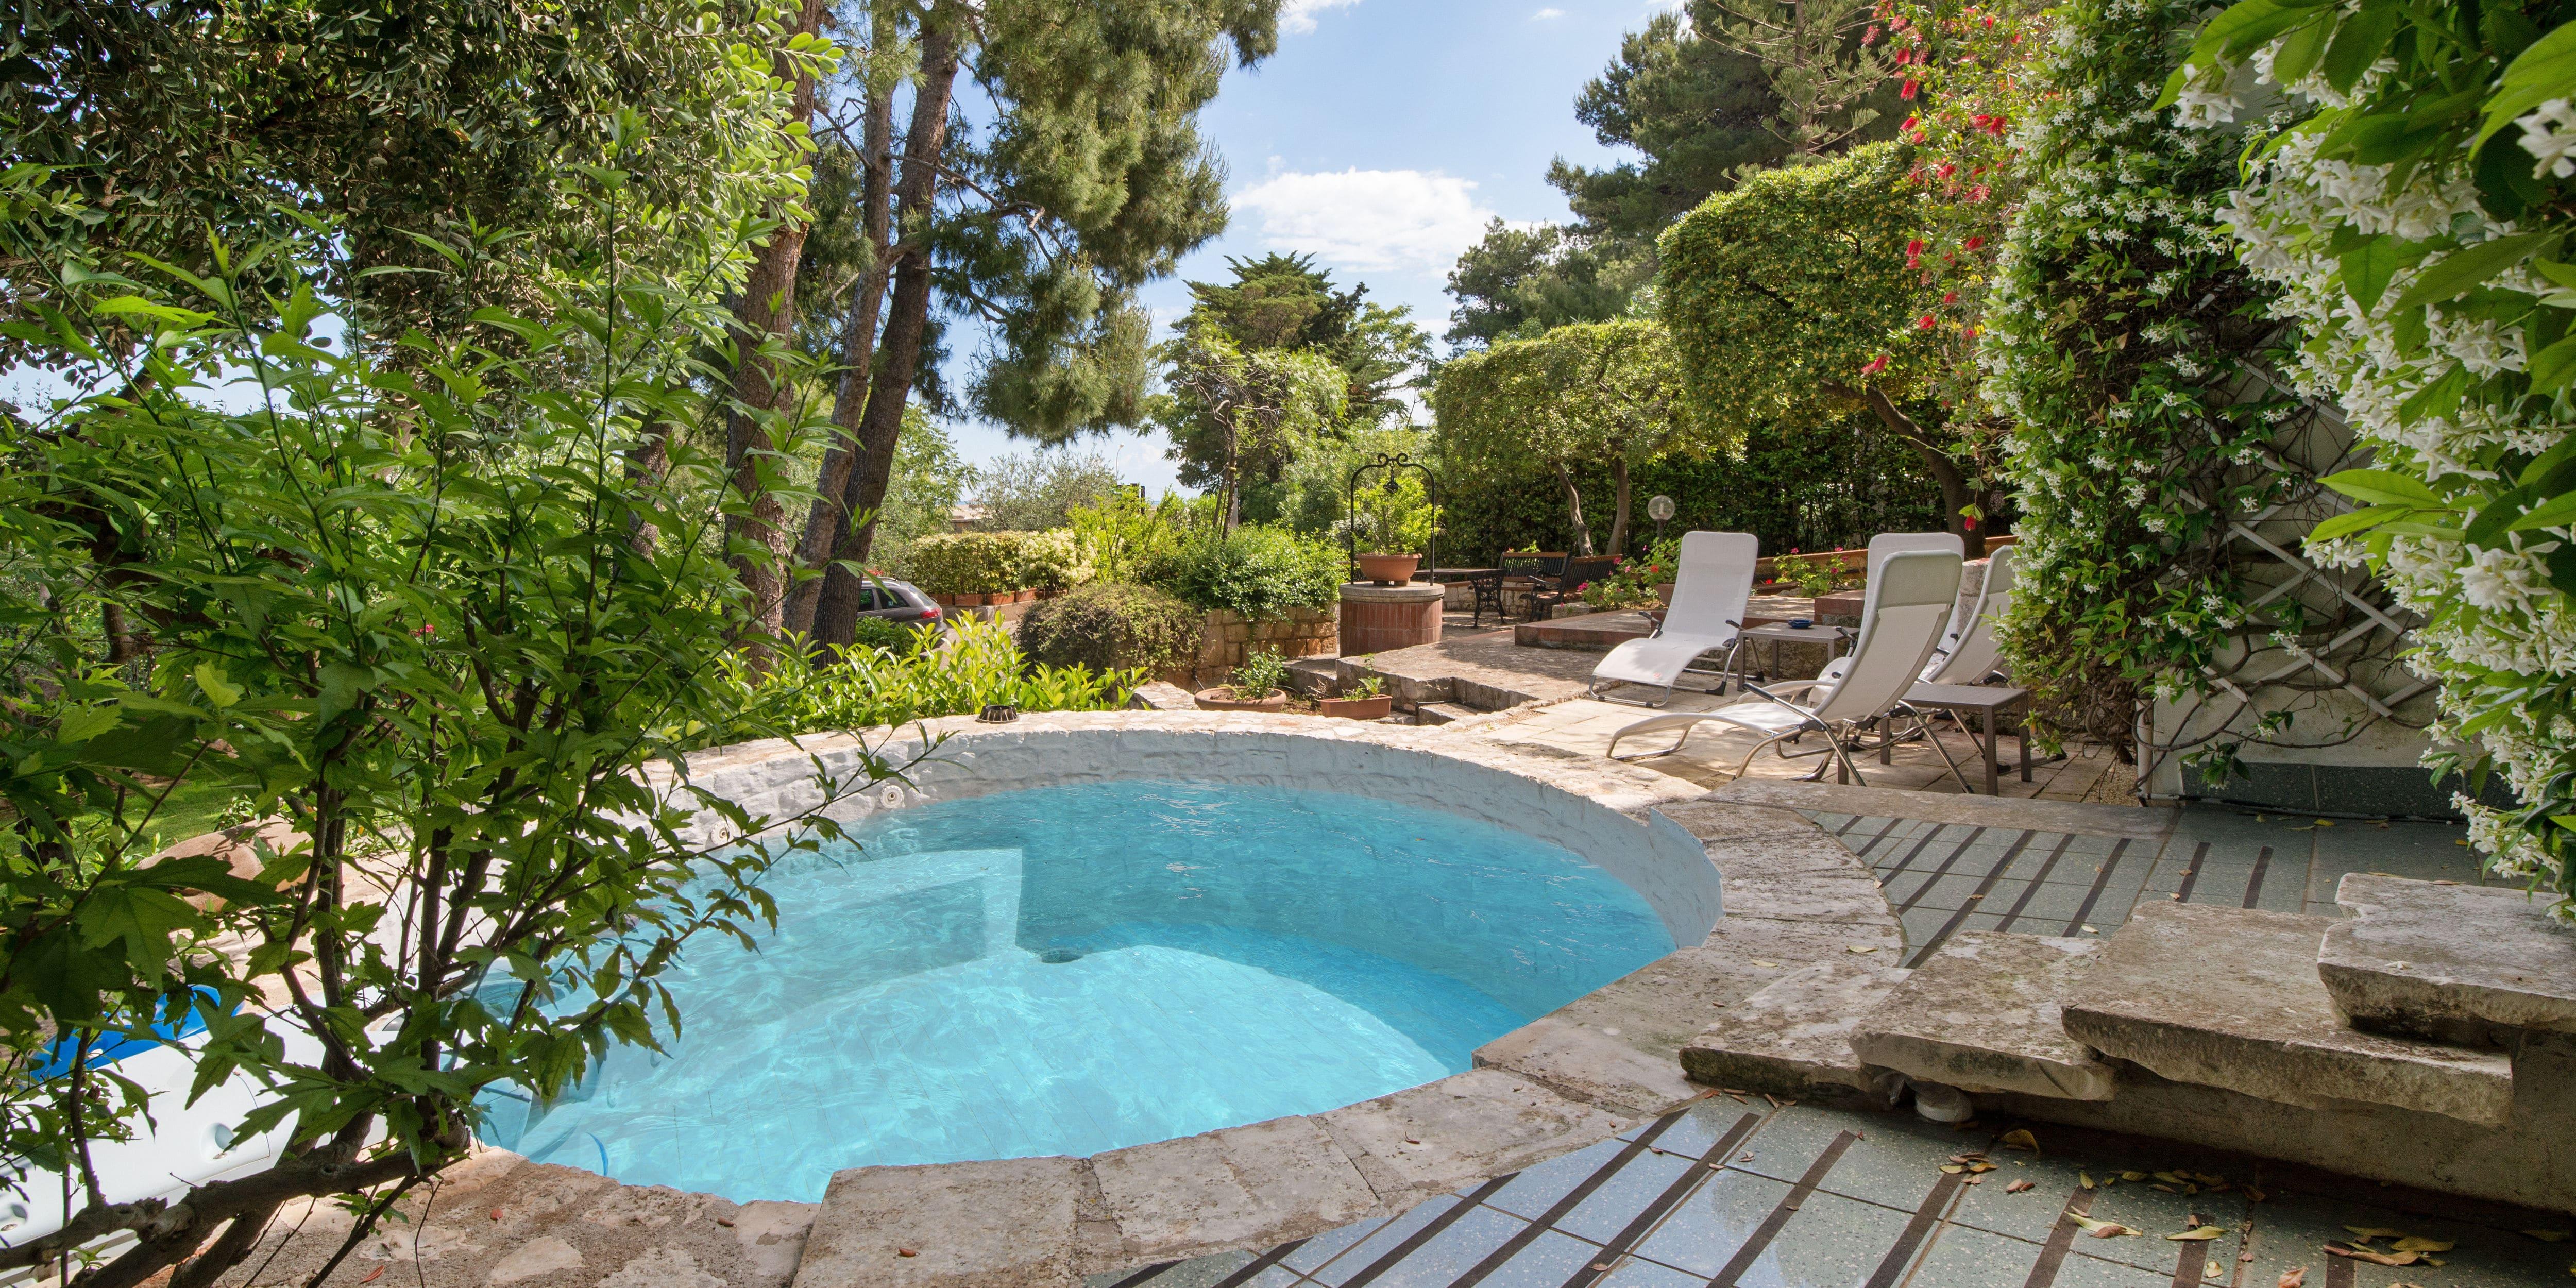 klein zwembad in tuin